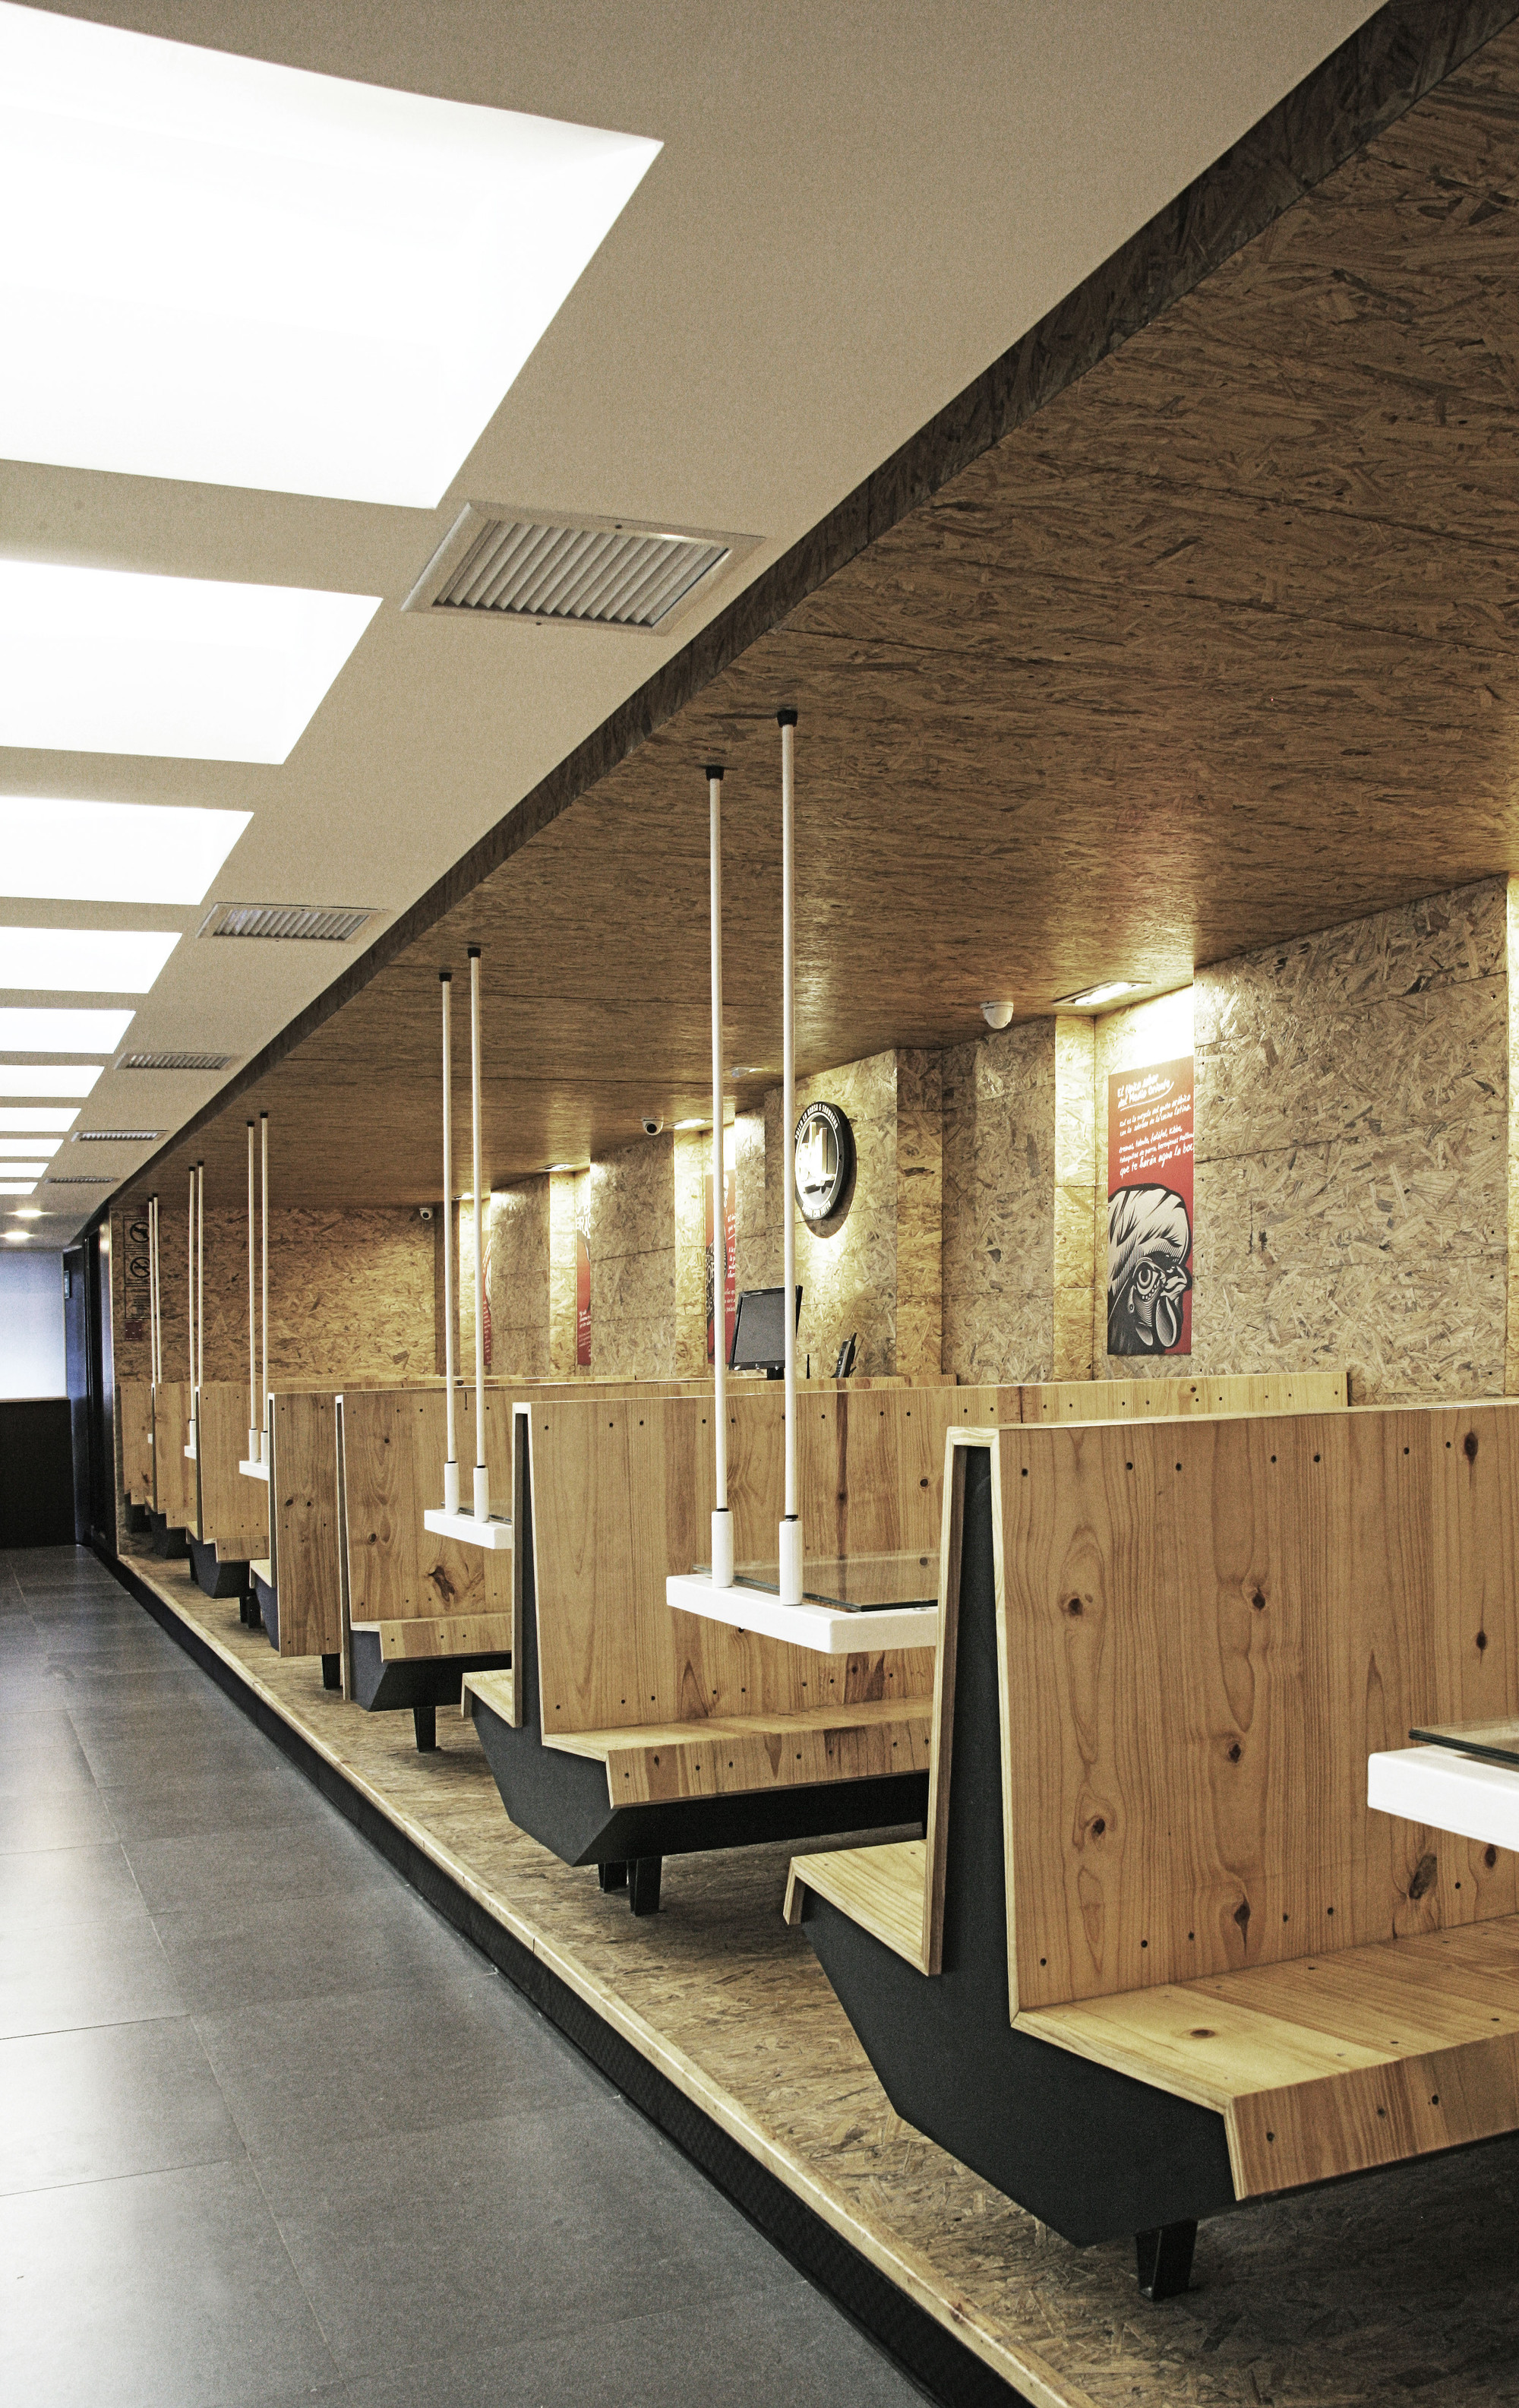 Galer A De Restaurante Kul S Nchez Taffur Arquitectos 4